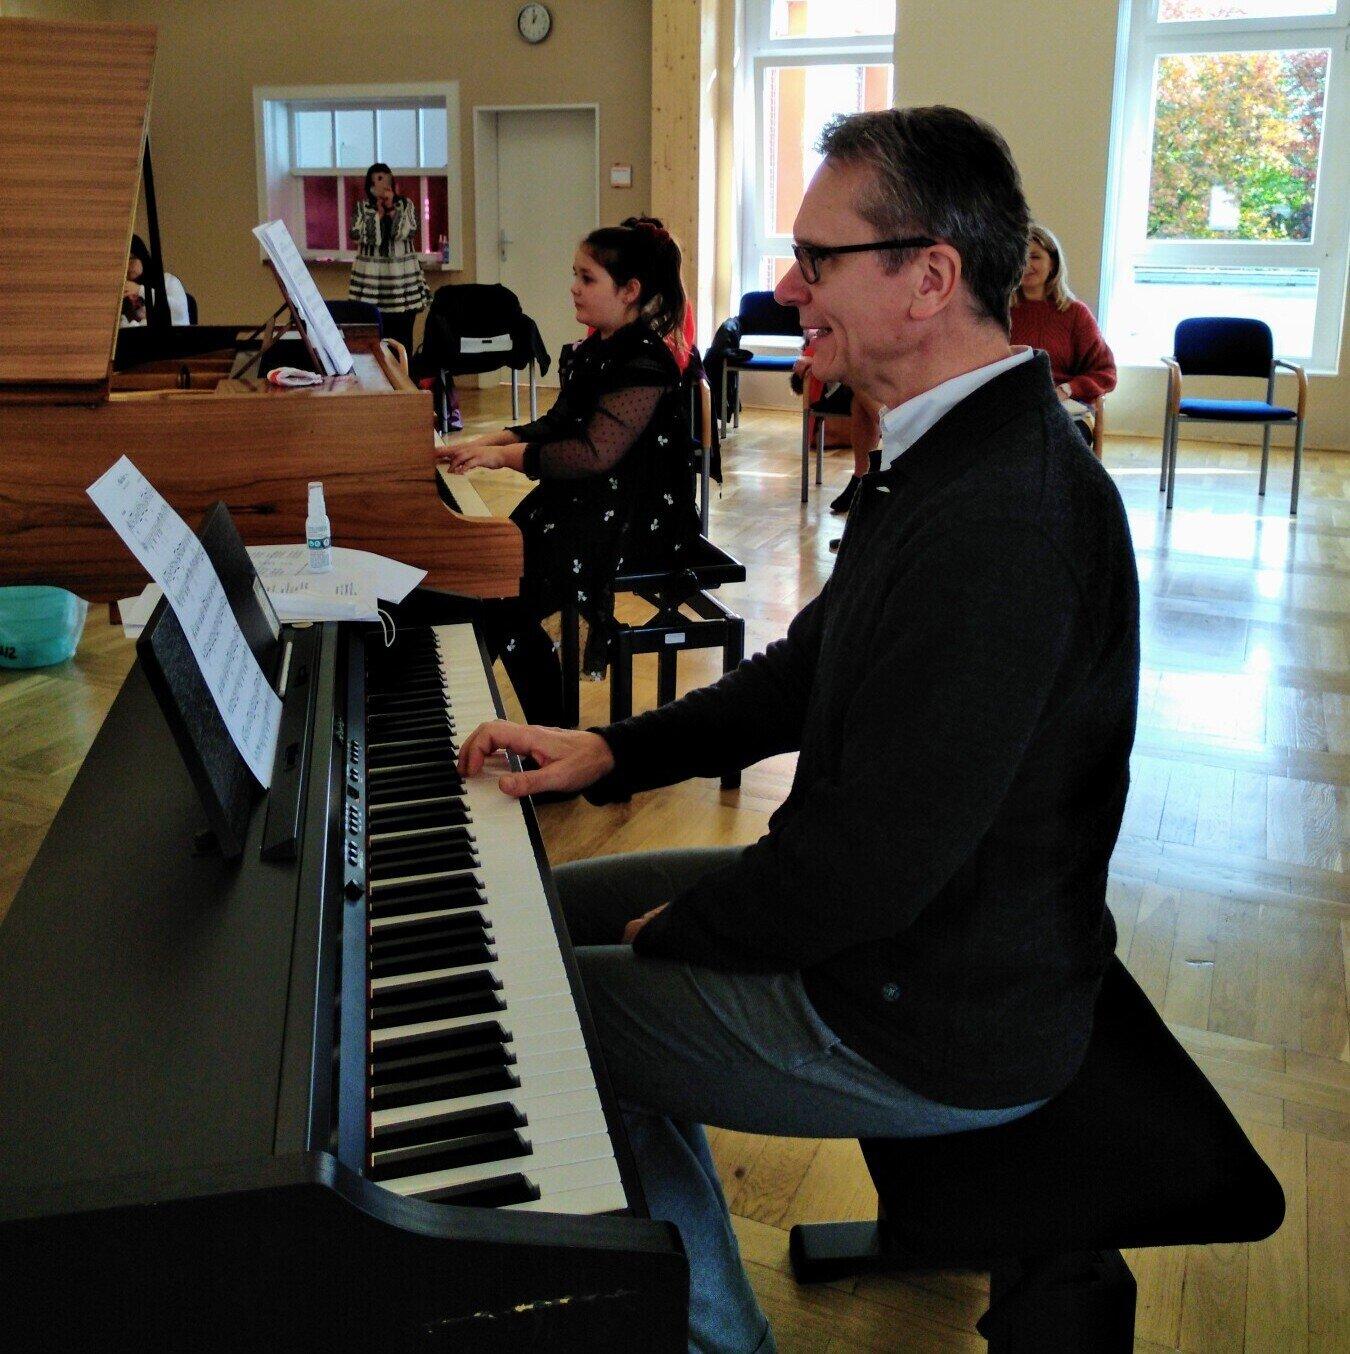 Klavierworkshop in Parchim mit Prof. Stephan Imorde